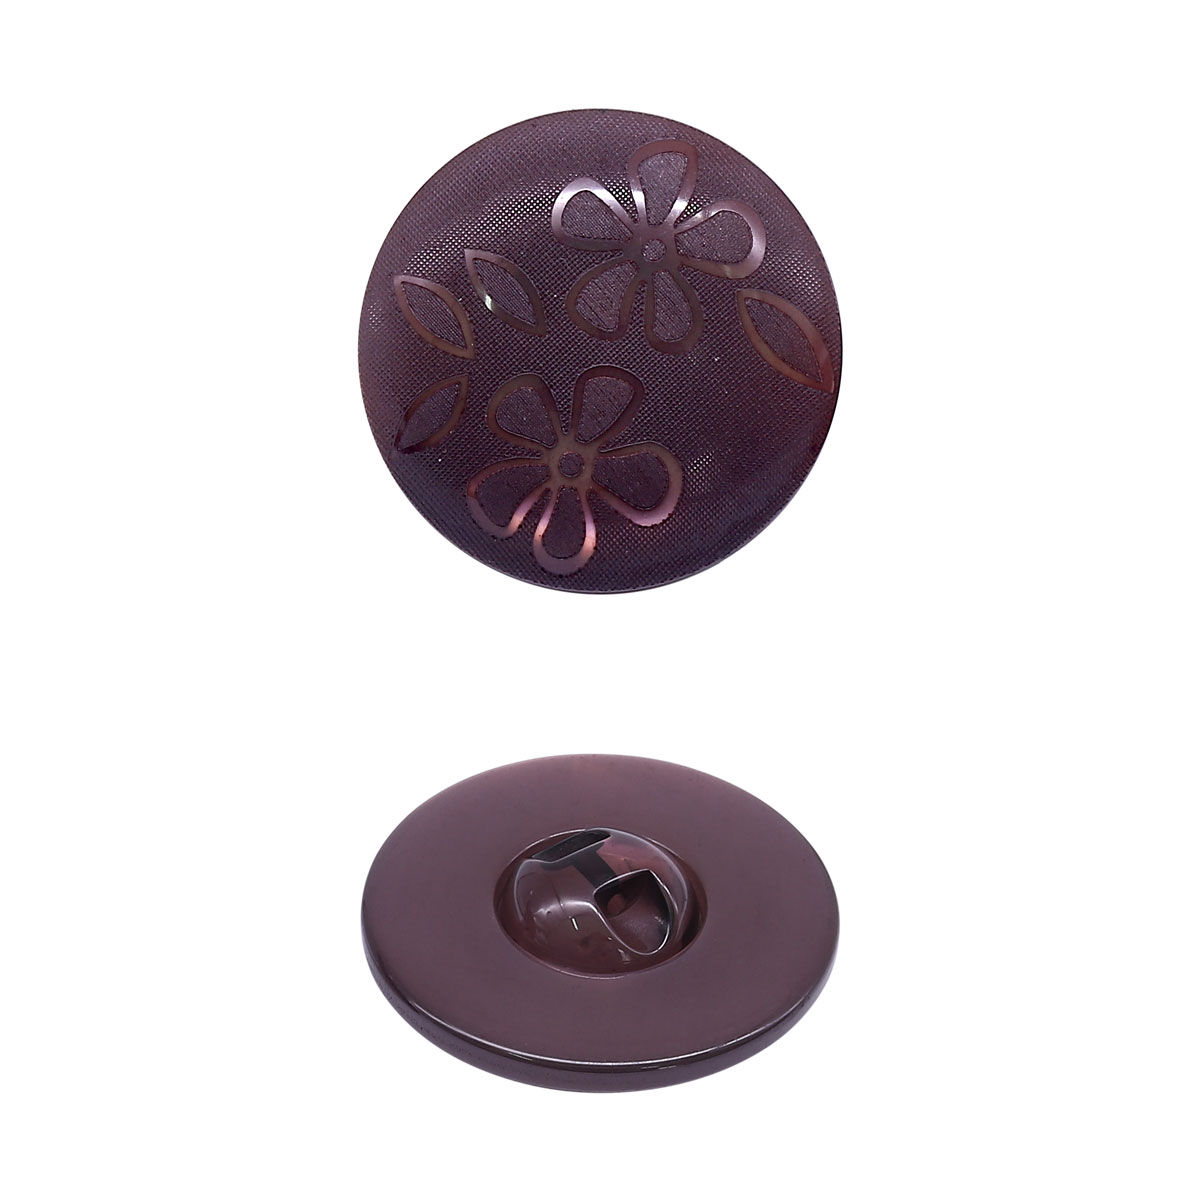 ГАН7452 Пуговица 30мм (868 коричневый)